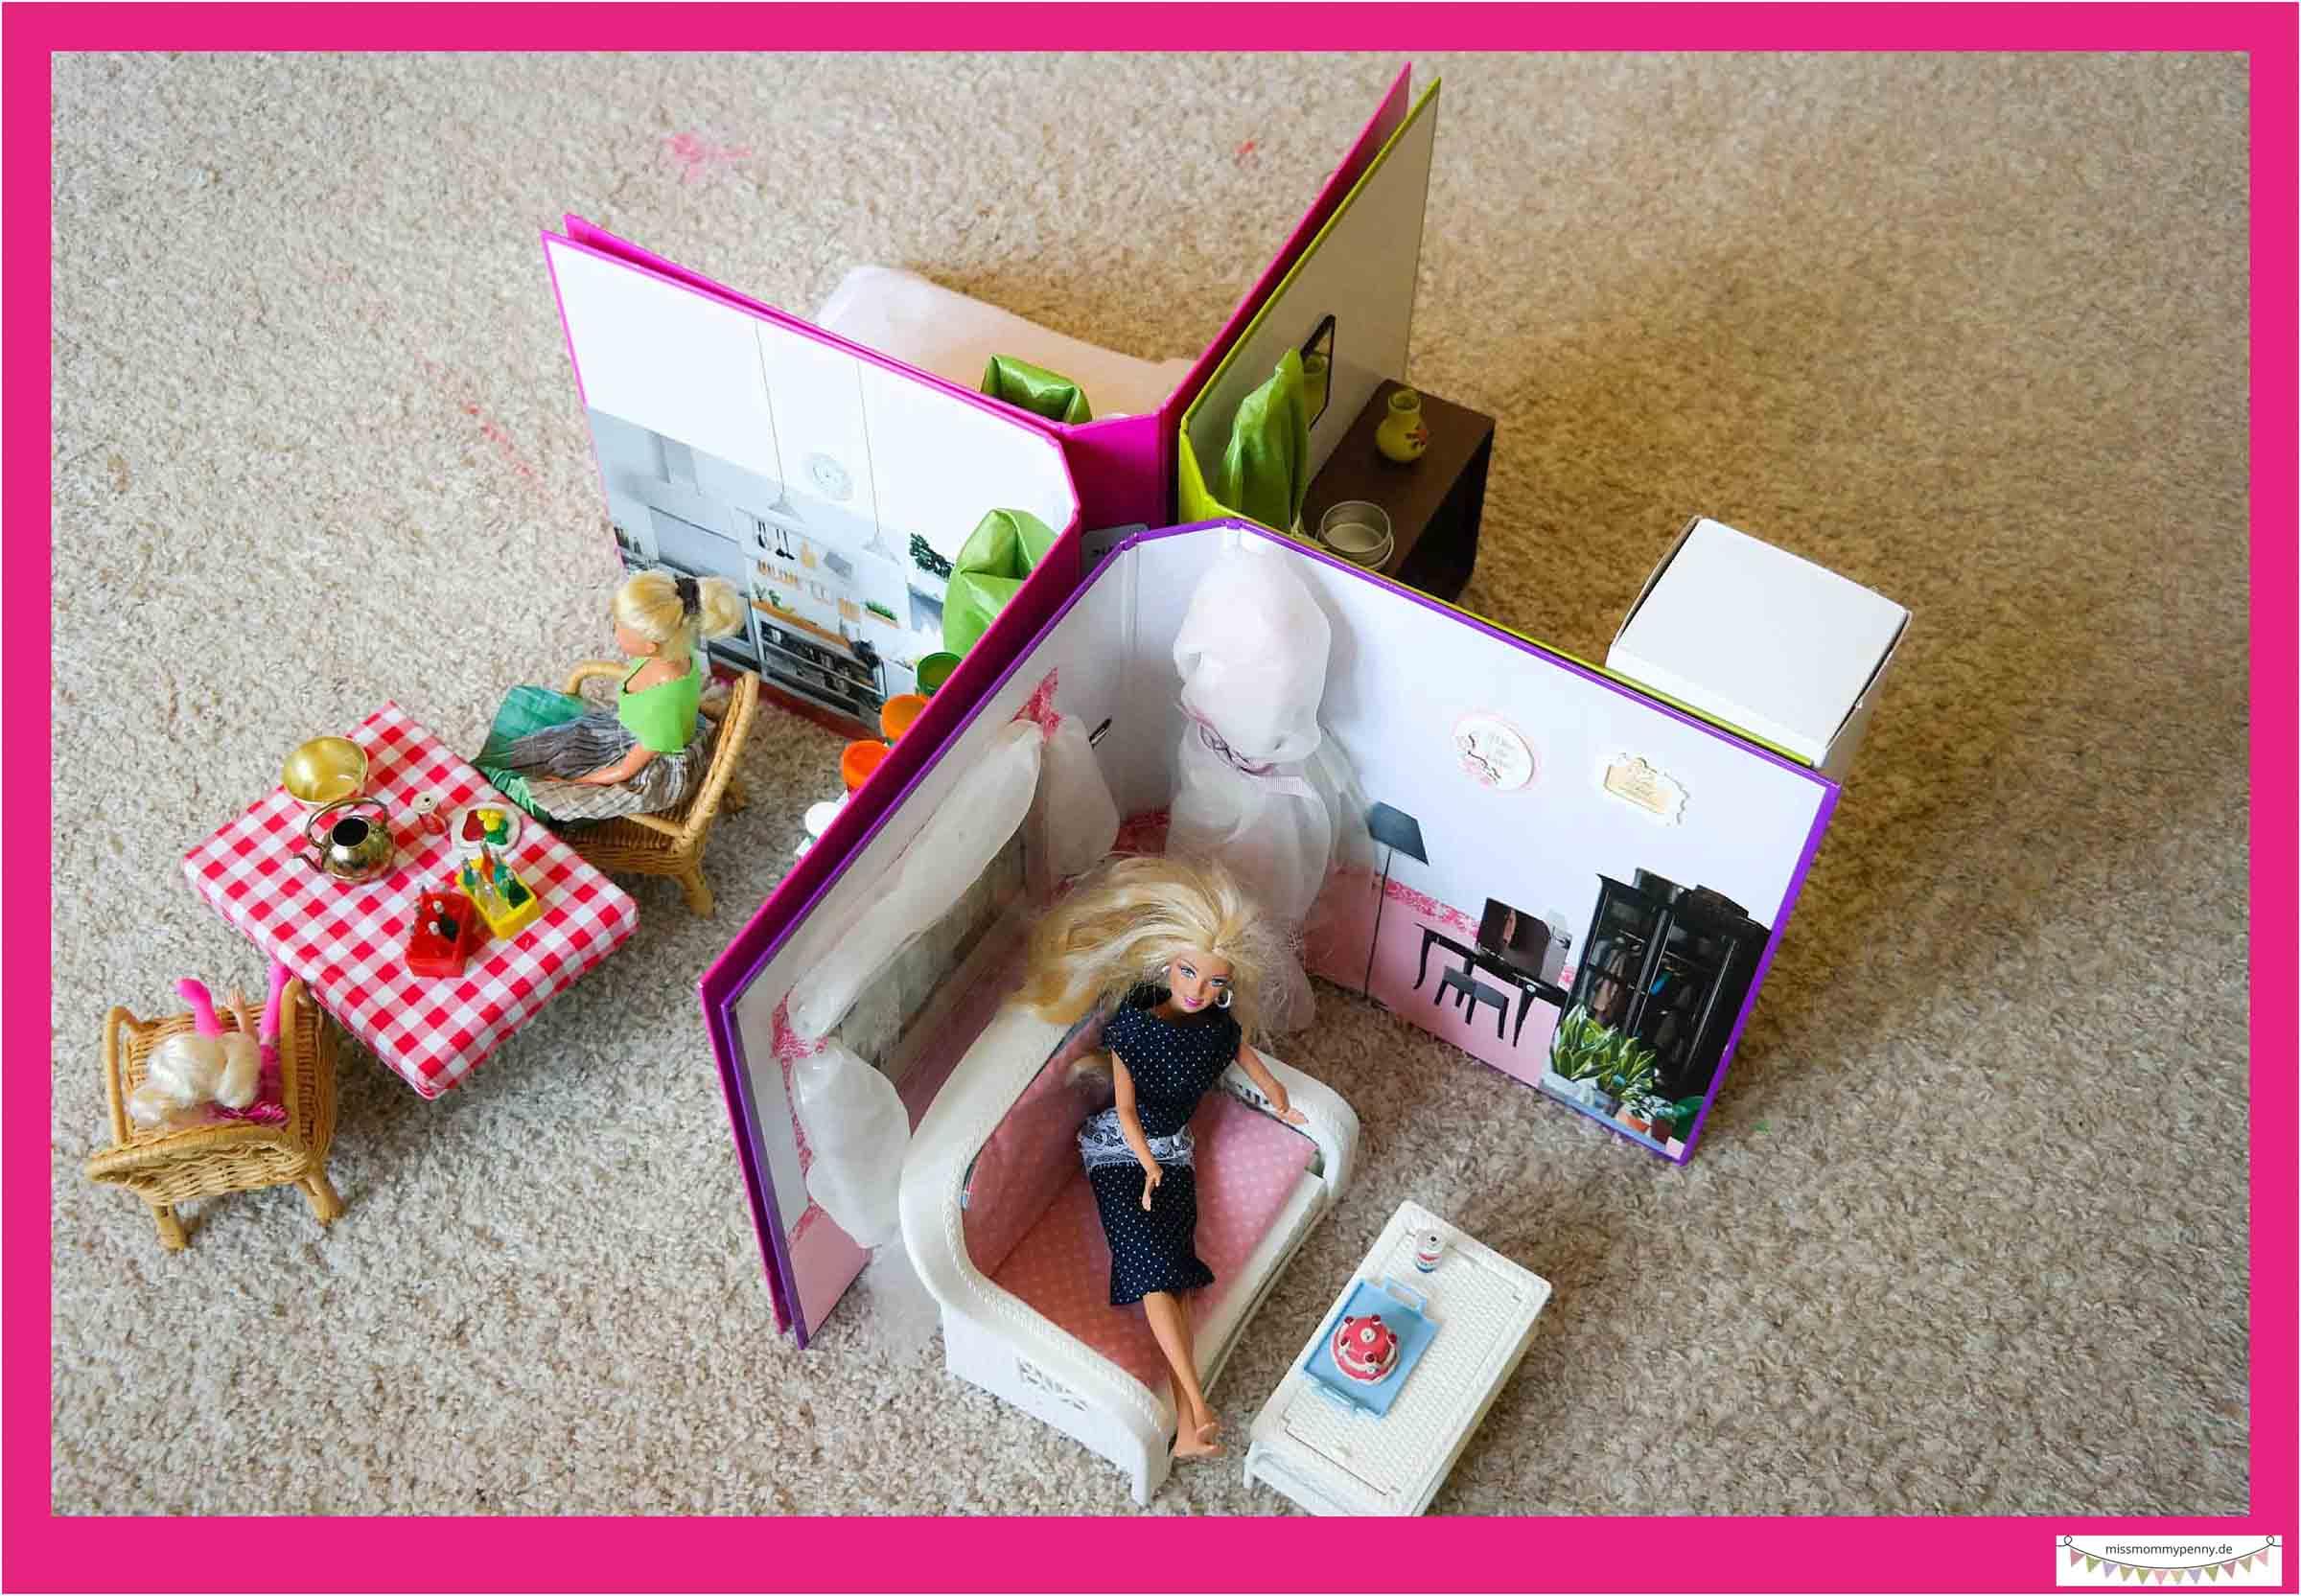 Selbstgebasteltes Spielzeug Archive Missmommypenny